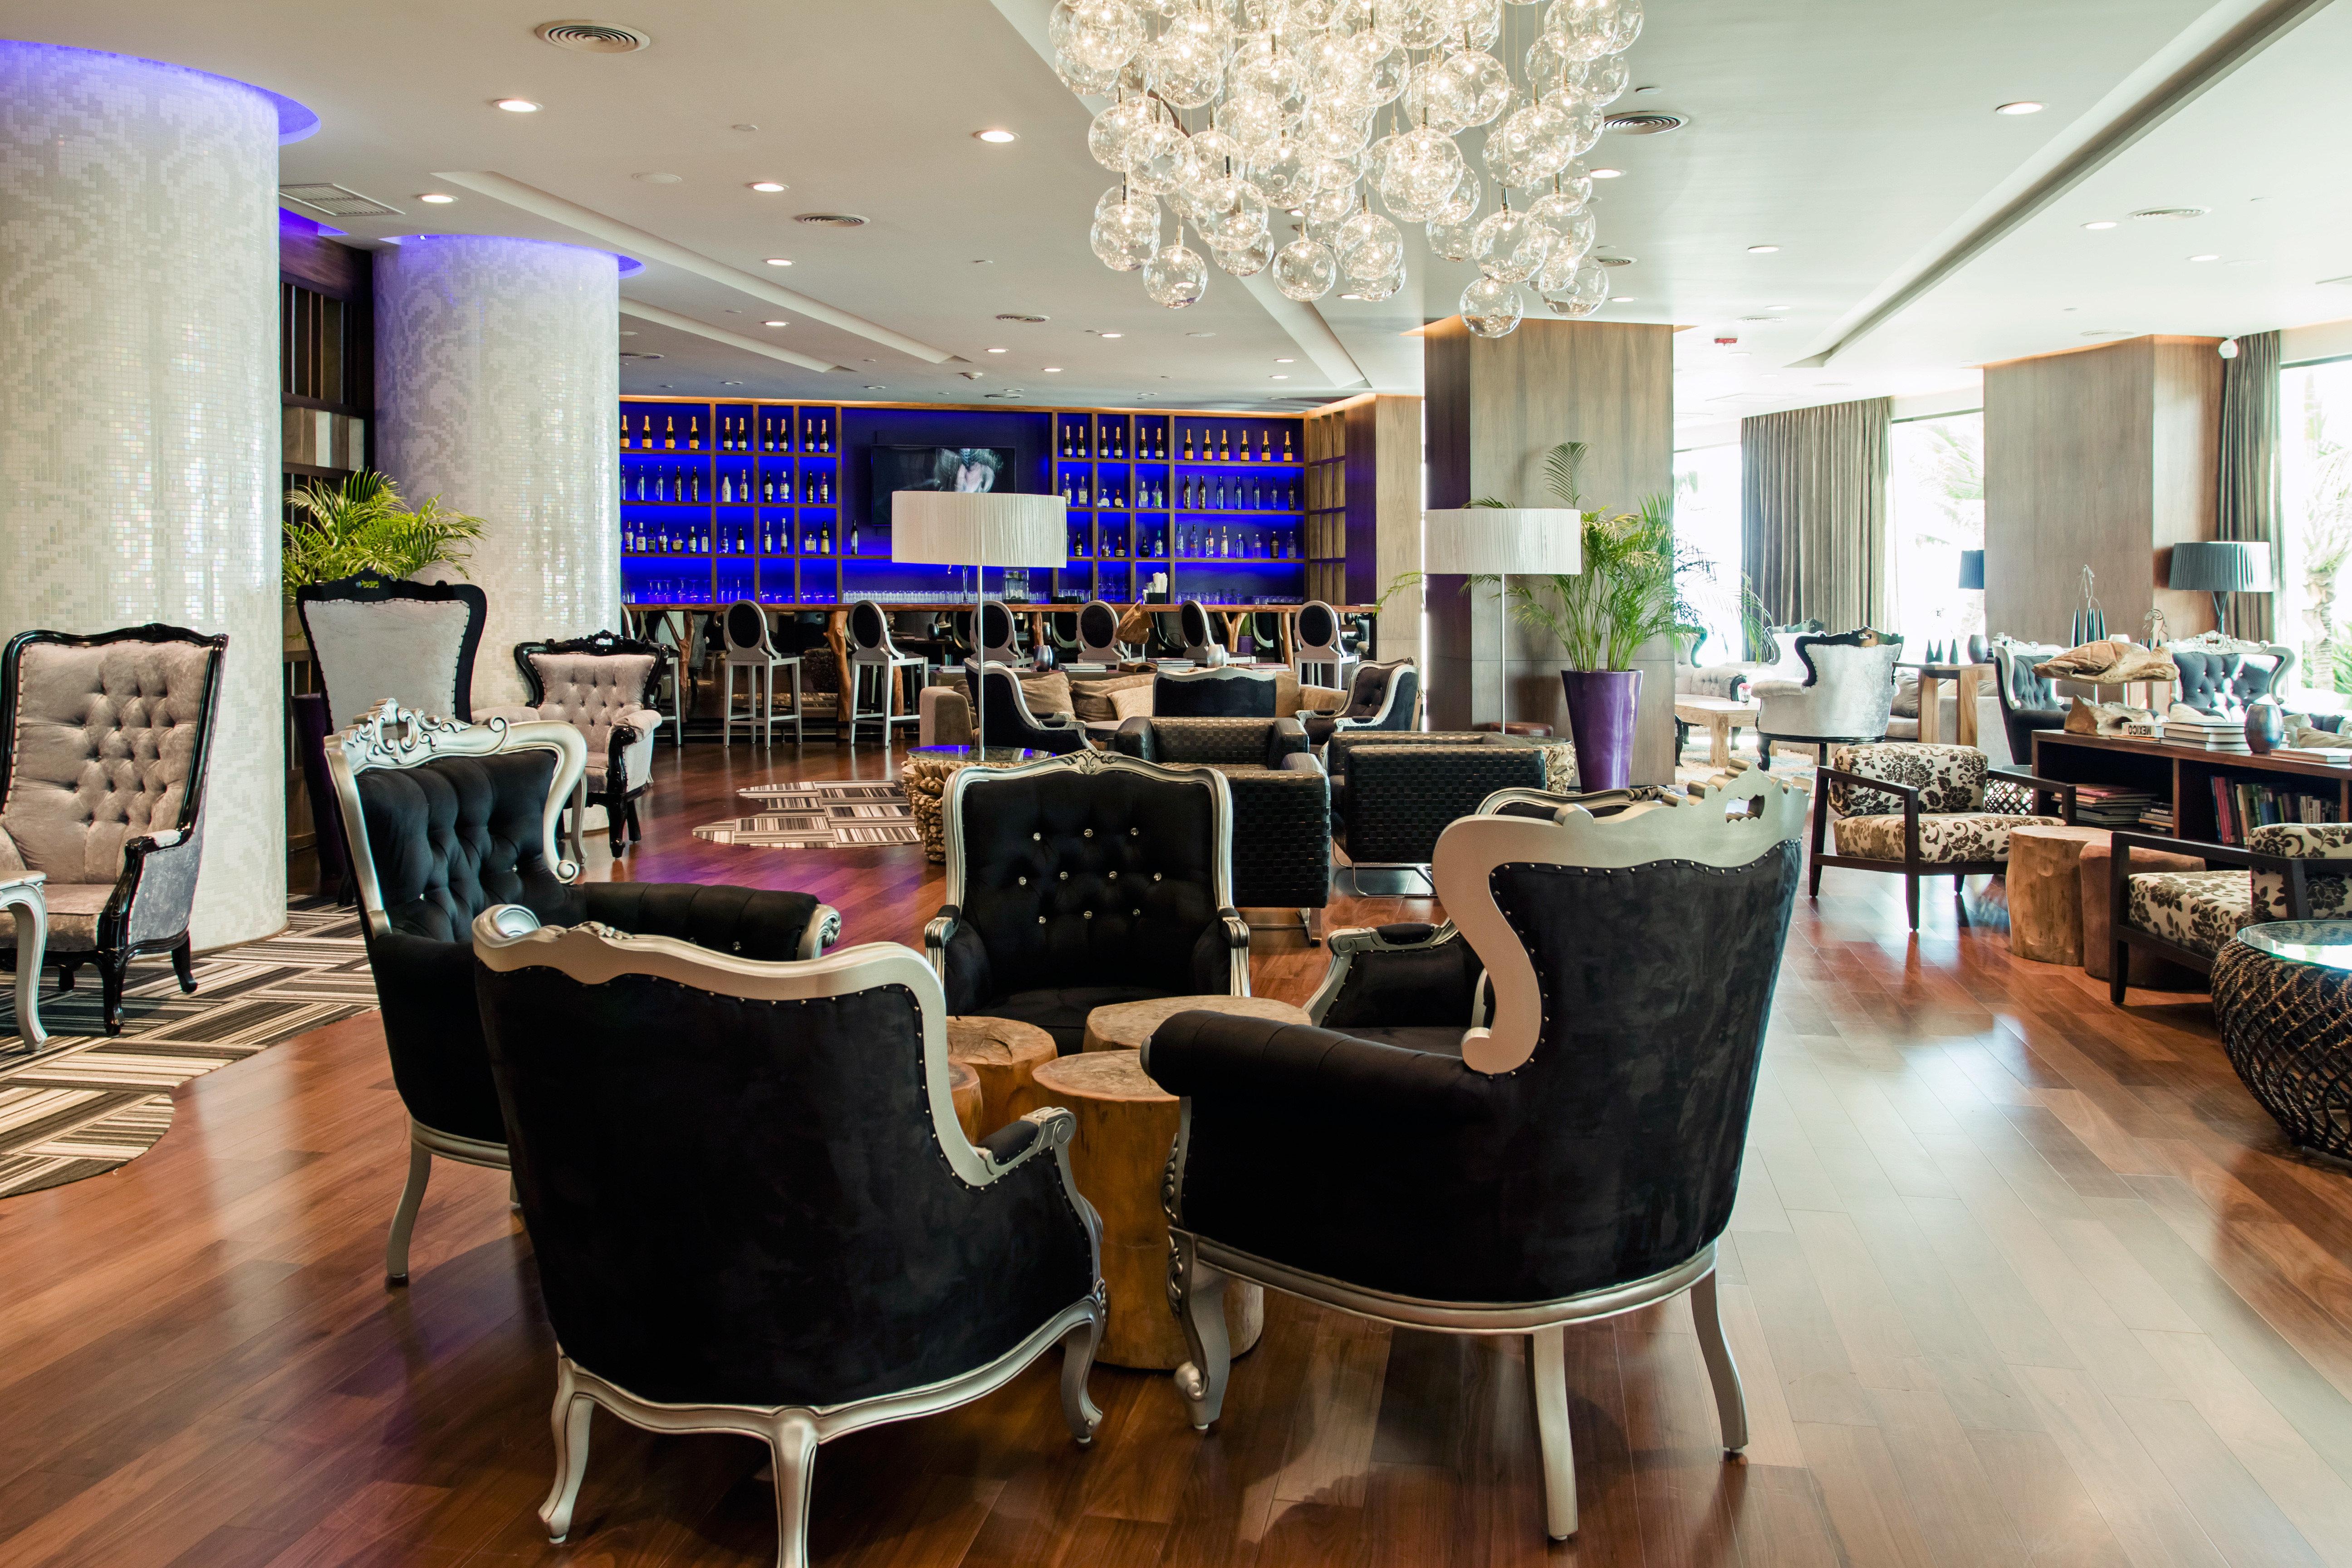 Bar Dining Drink Eat Elegant Hip Luxury Modern chair Lobby function hall restaurant conference hall living room